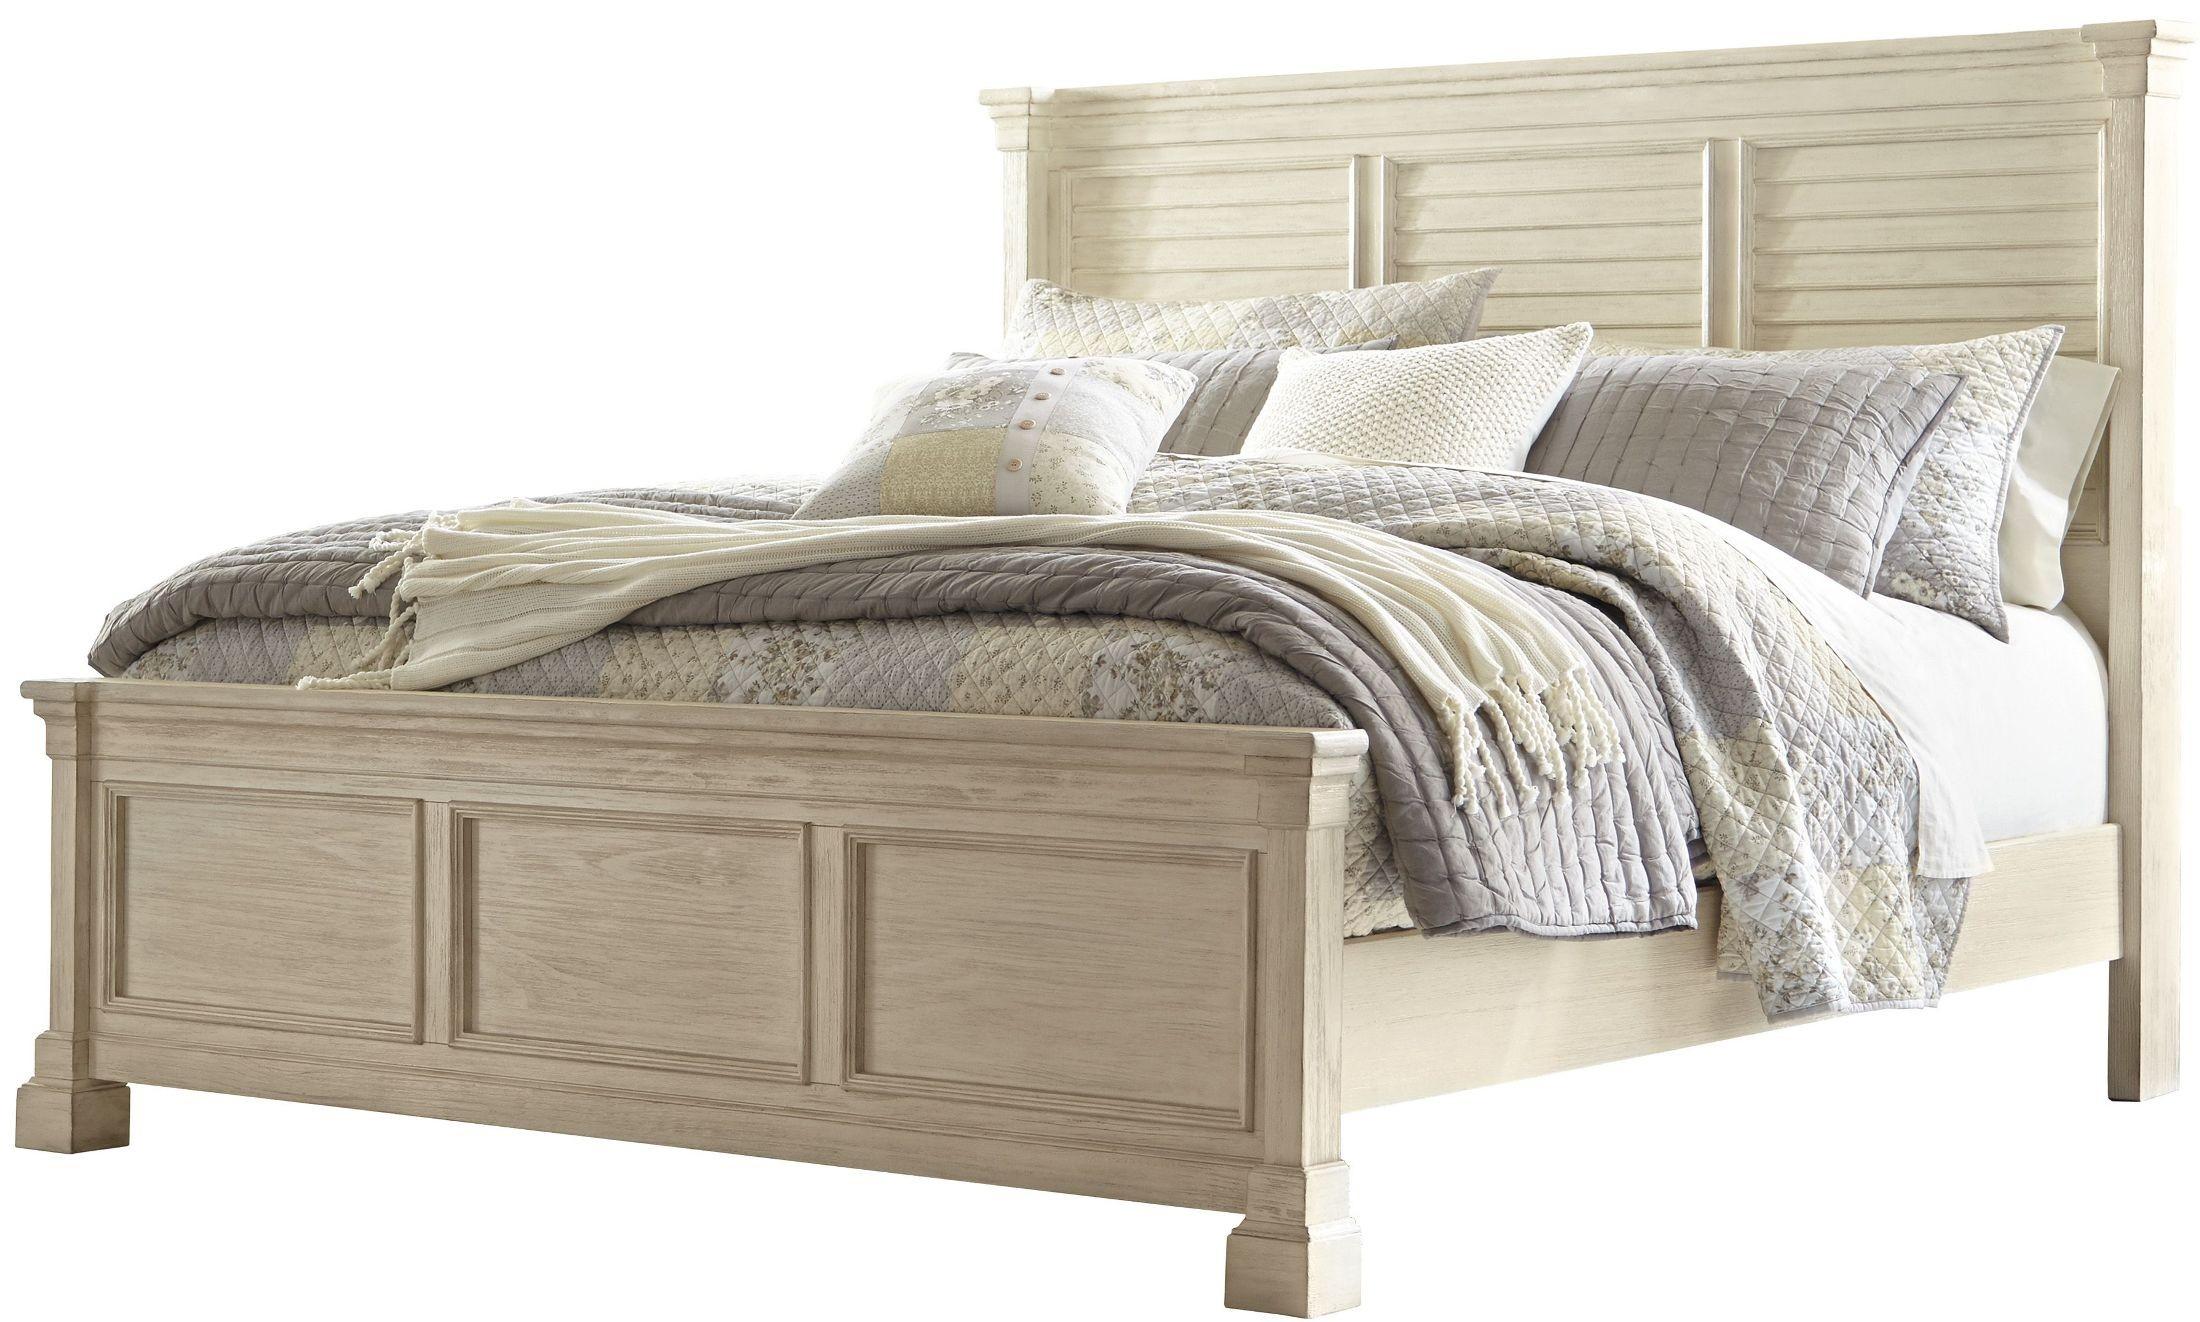 bolanburg white louvered panel bedroom set b647 54 77 96 ashley. Black Bedroom Furniture Sets. Home Design Ideas